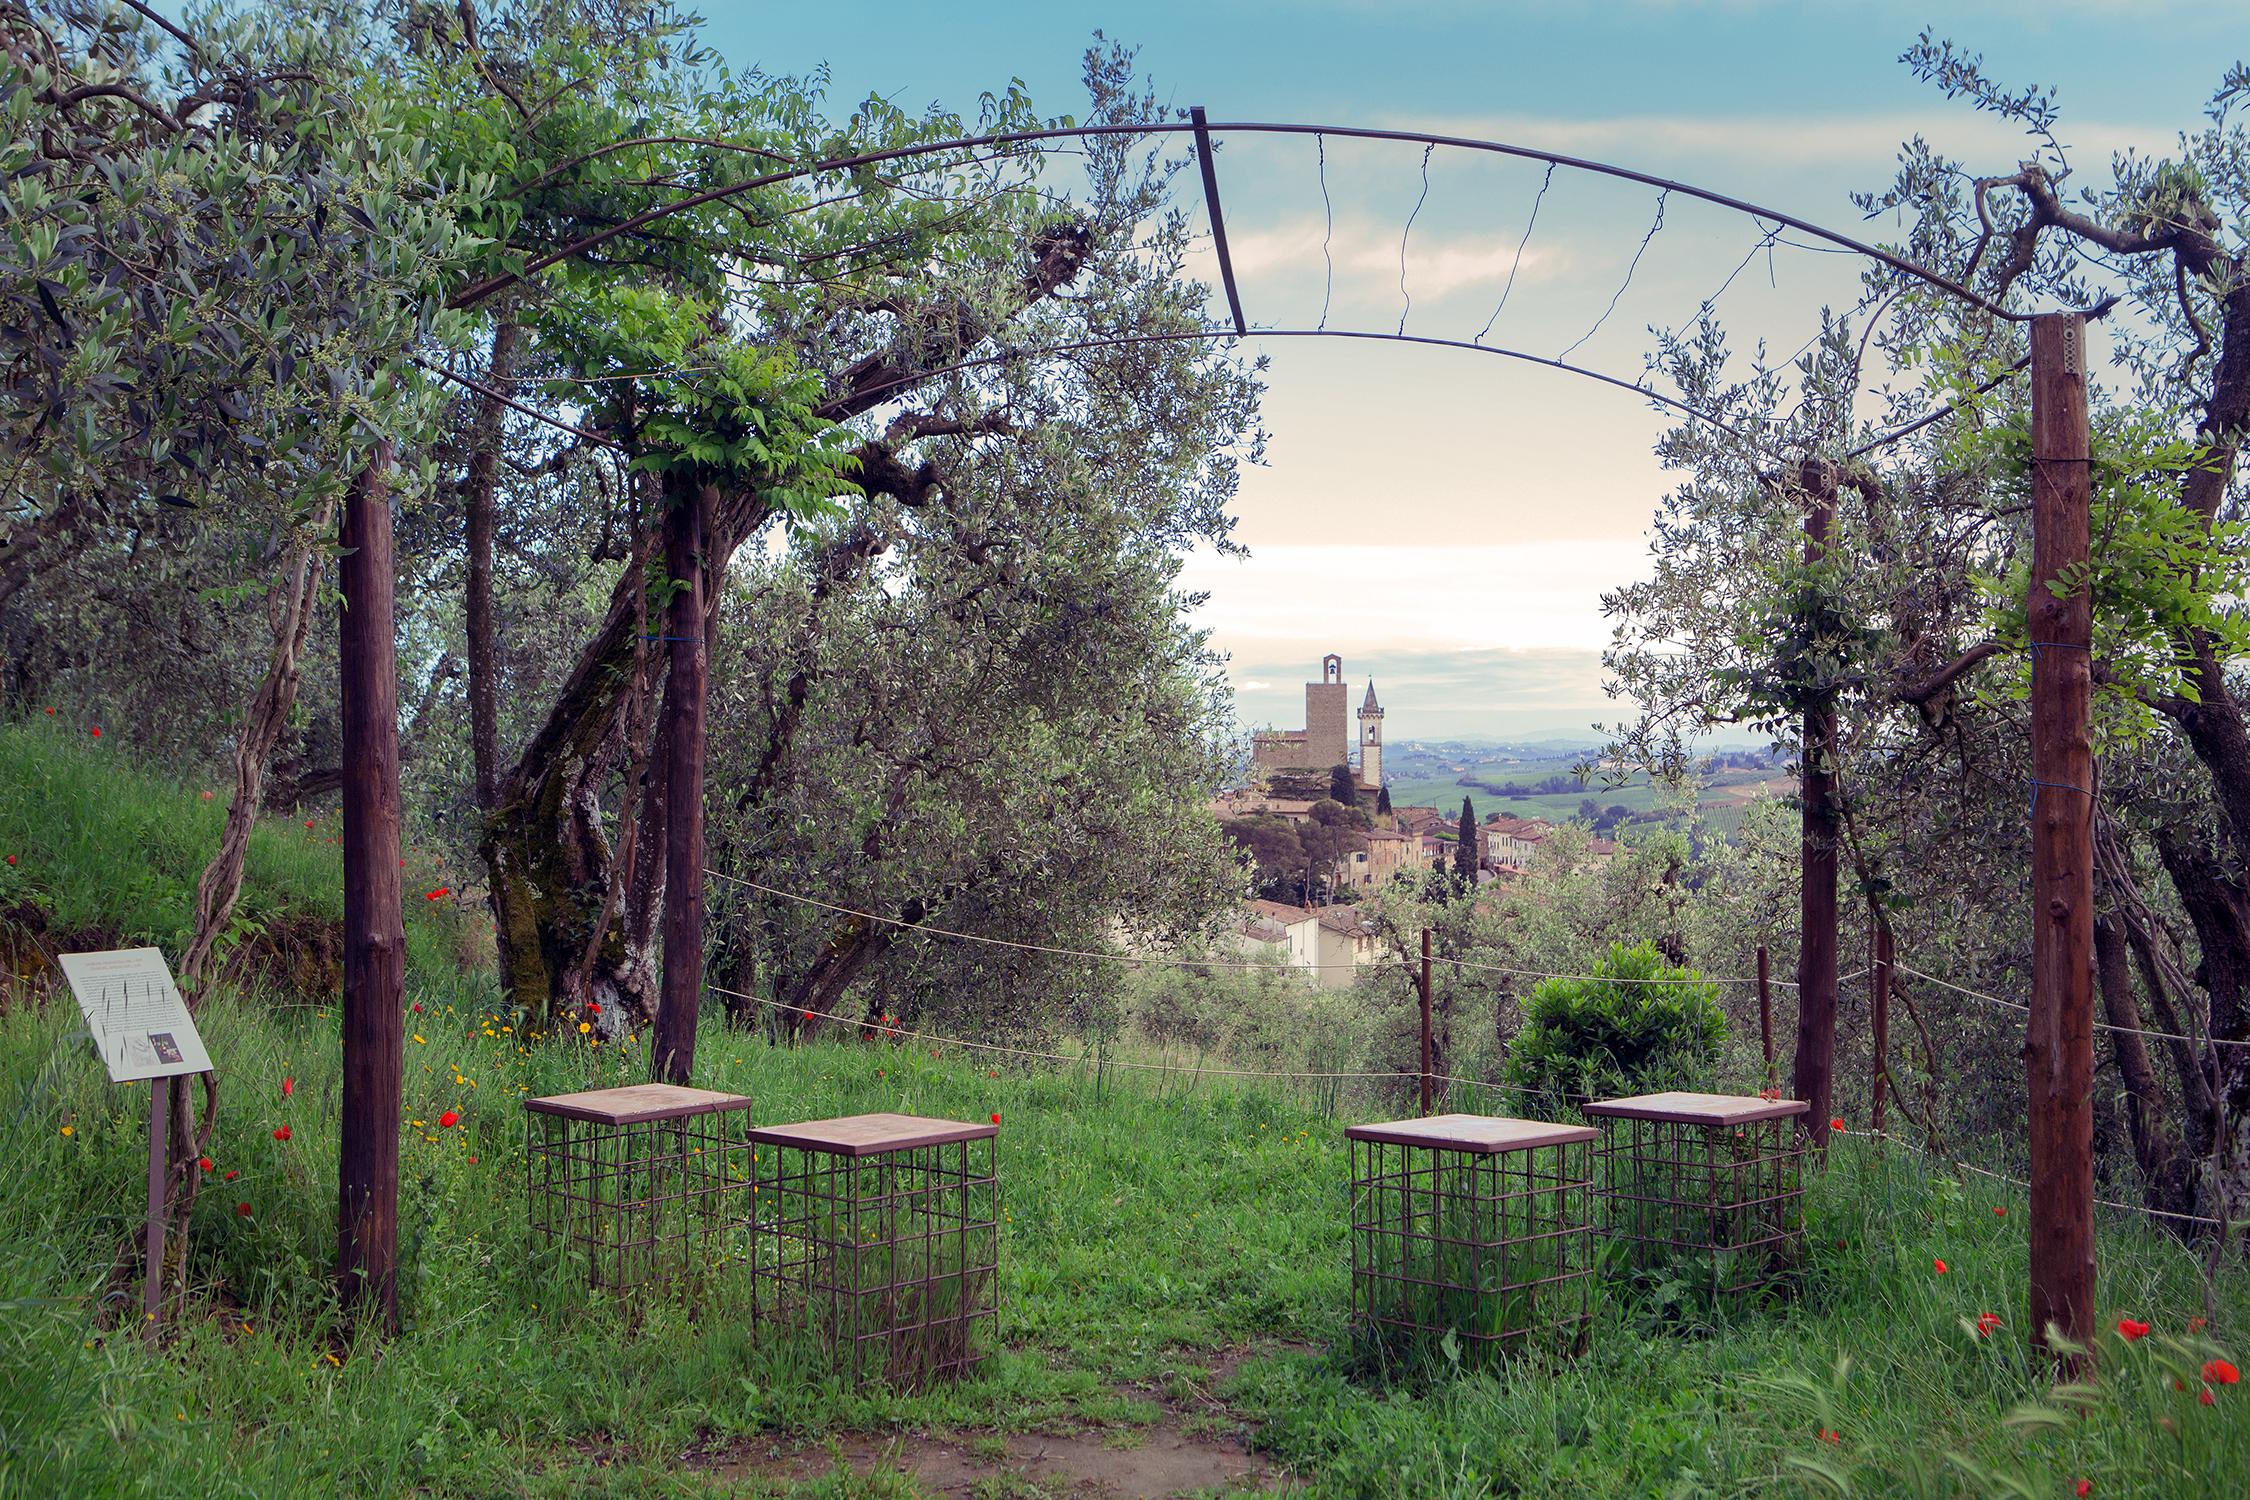 The village of Vinci (FI) where Leonardo was born on April 15, 1452.